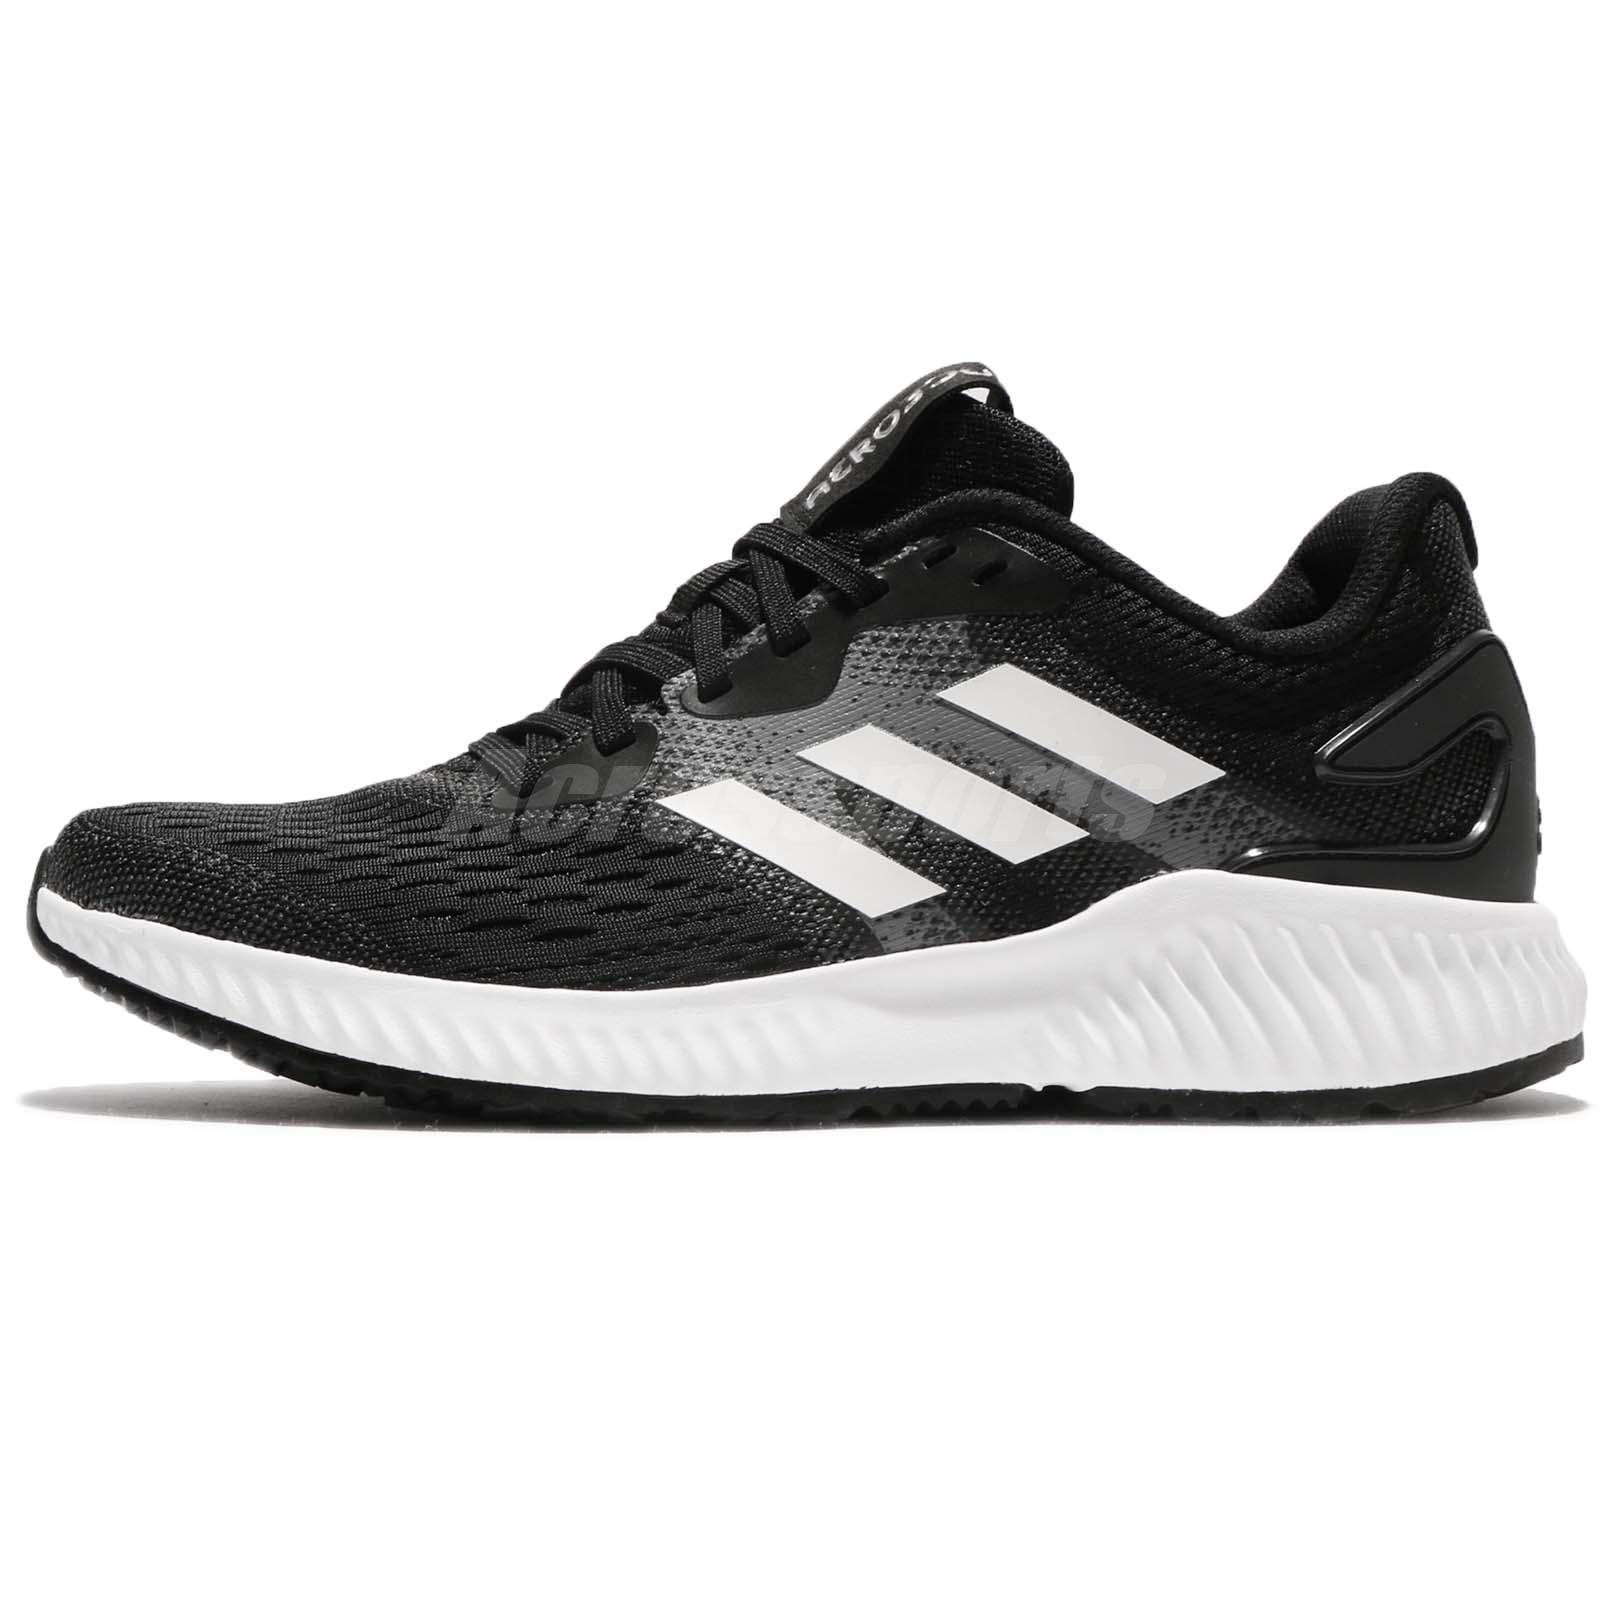 adidas aerobounce 2 running shoes ladies